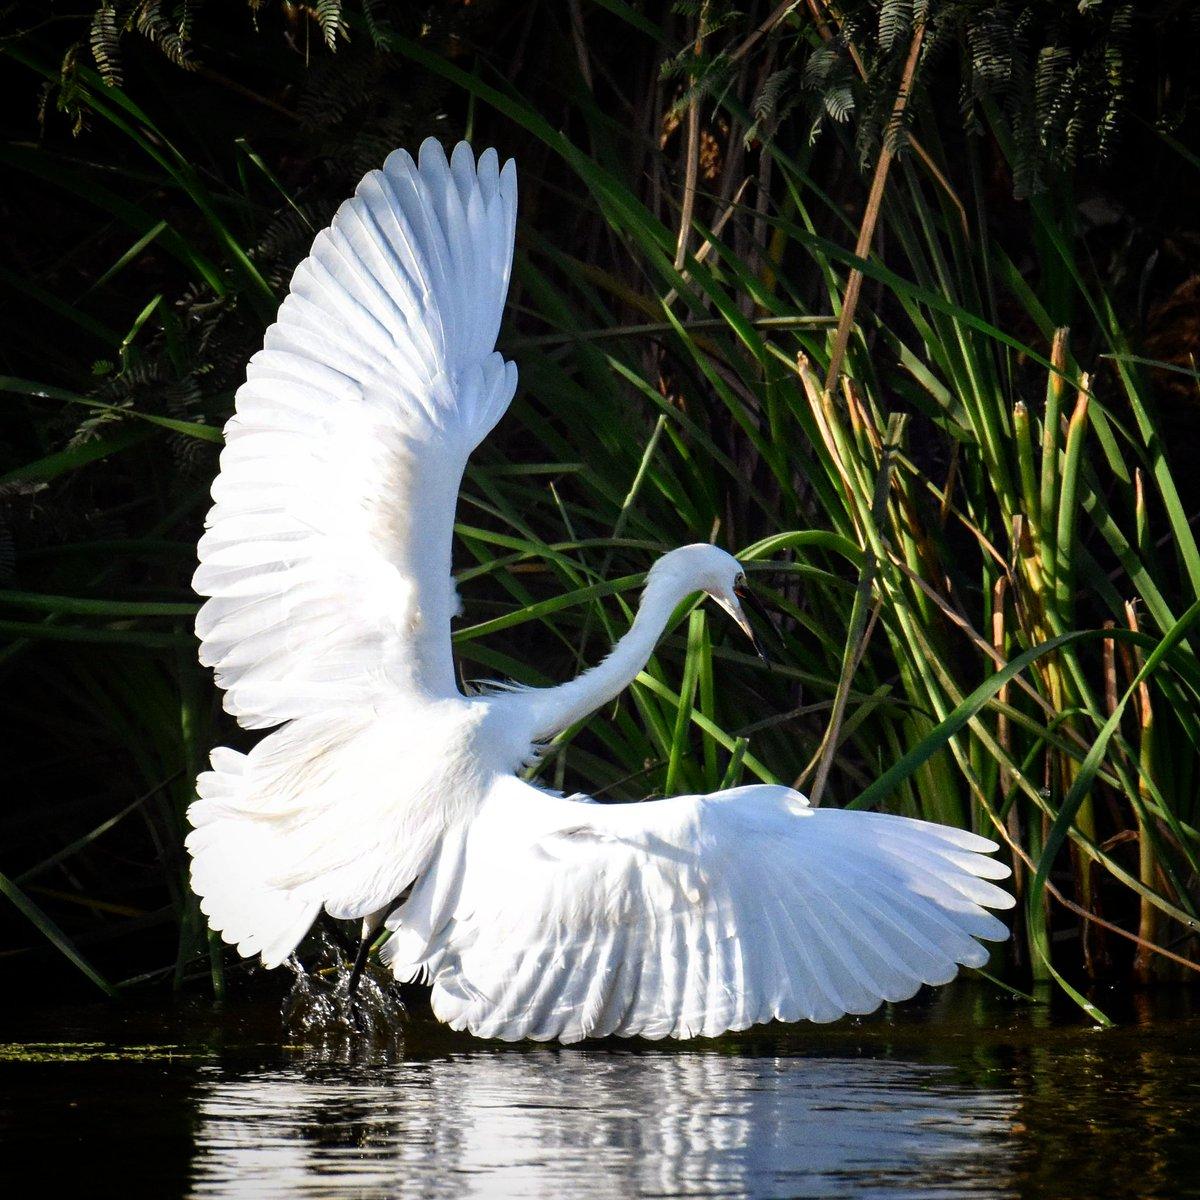 Little Egret Location: #Bahra #Makkah Region #SaudiArabia #birds #photooftheday #wildlife #ksa #nature #photo #photography #photographer #amazing #travel #birdsphotography #sauditourism #beauty #wildlifephotography #beautiful @SaudiMagazine @IASArabia @SCTAEN @SeeSaudi @SapracOrg